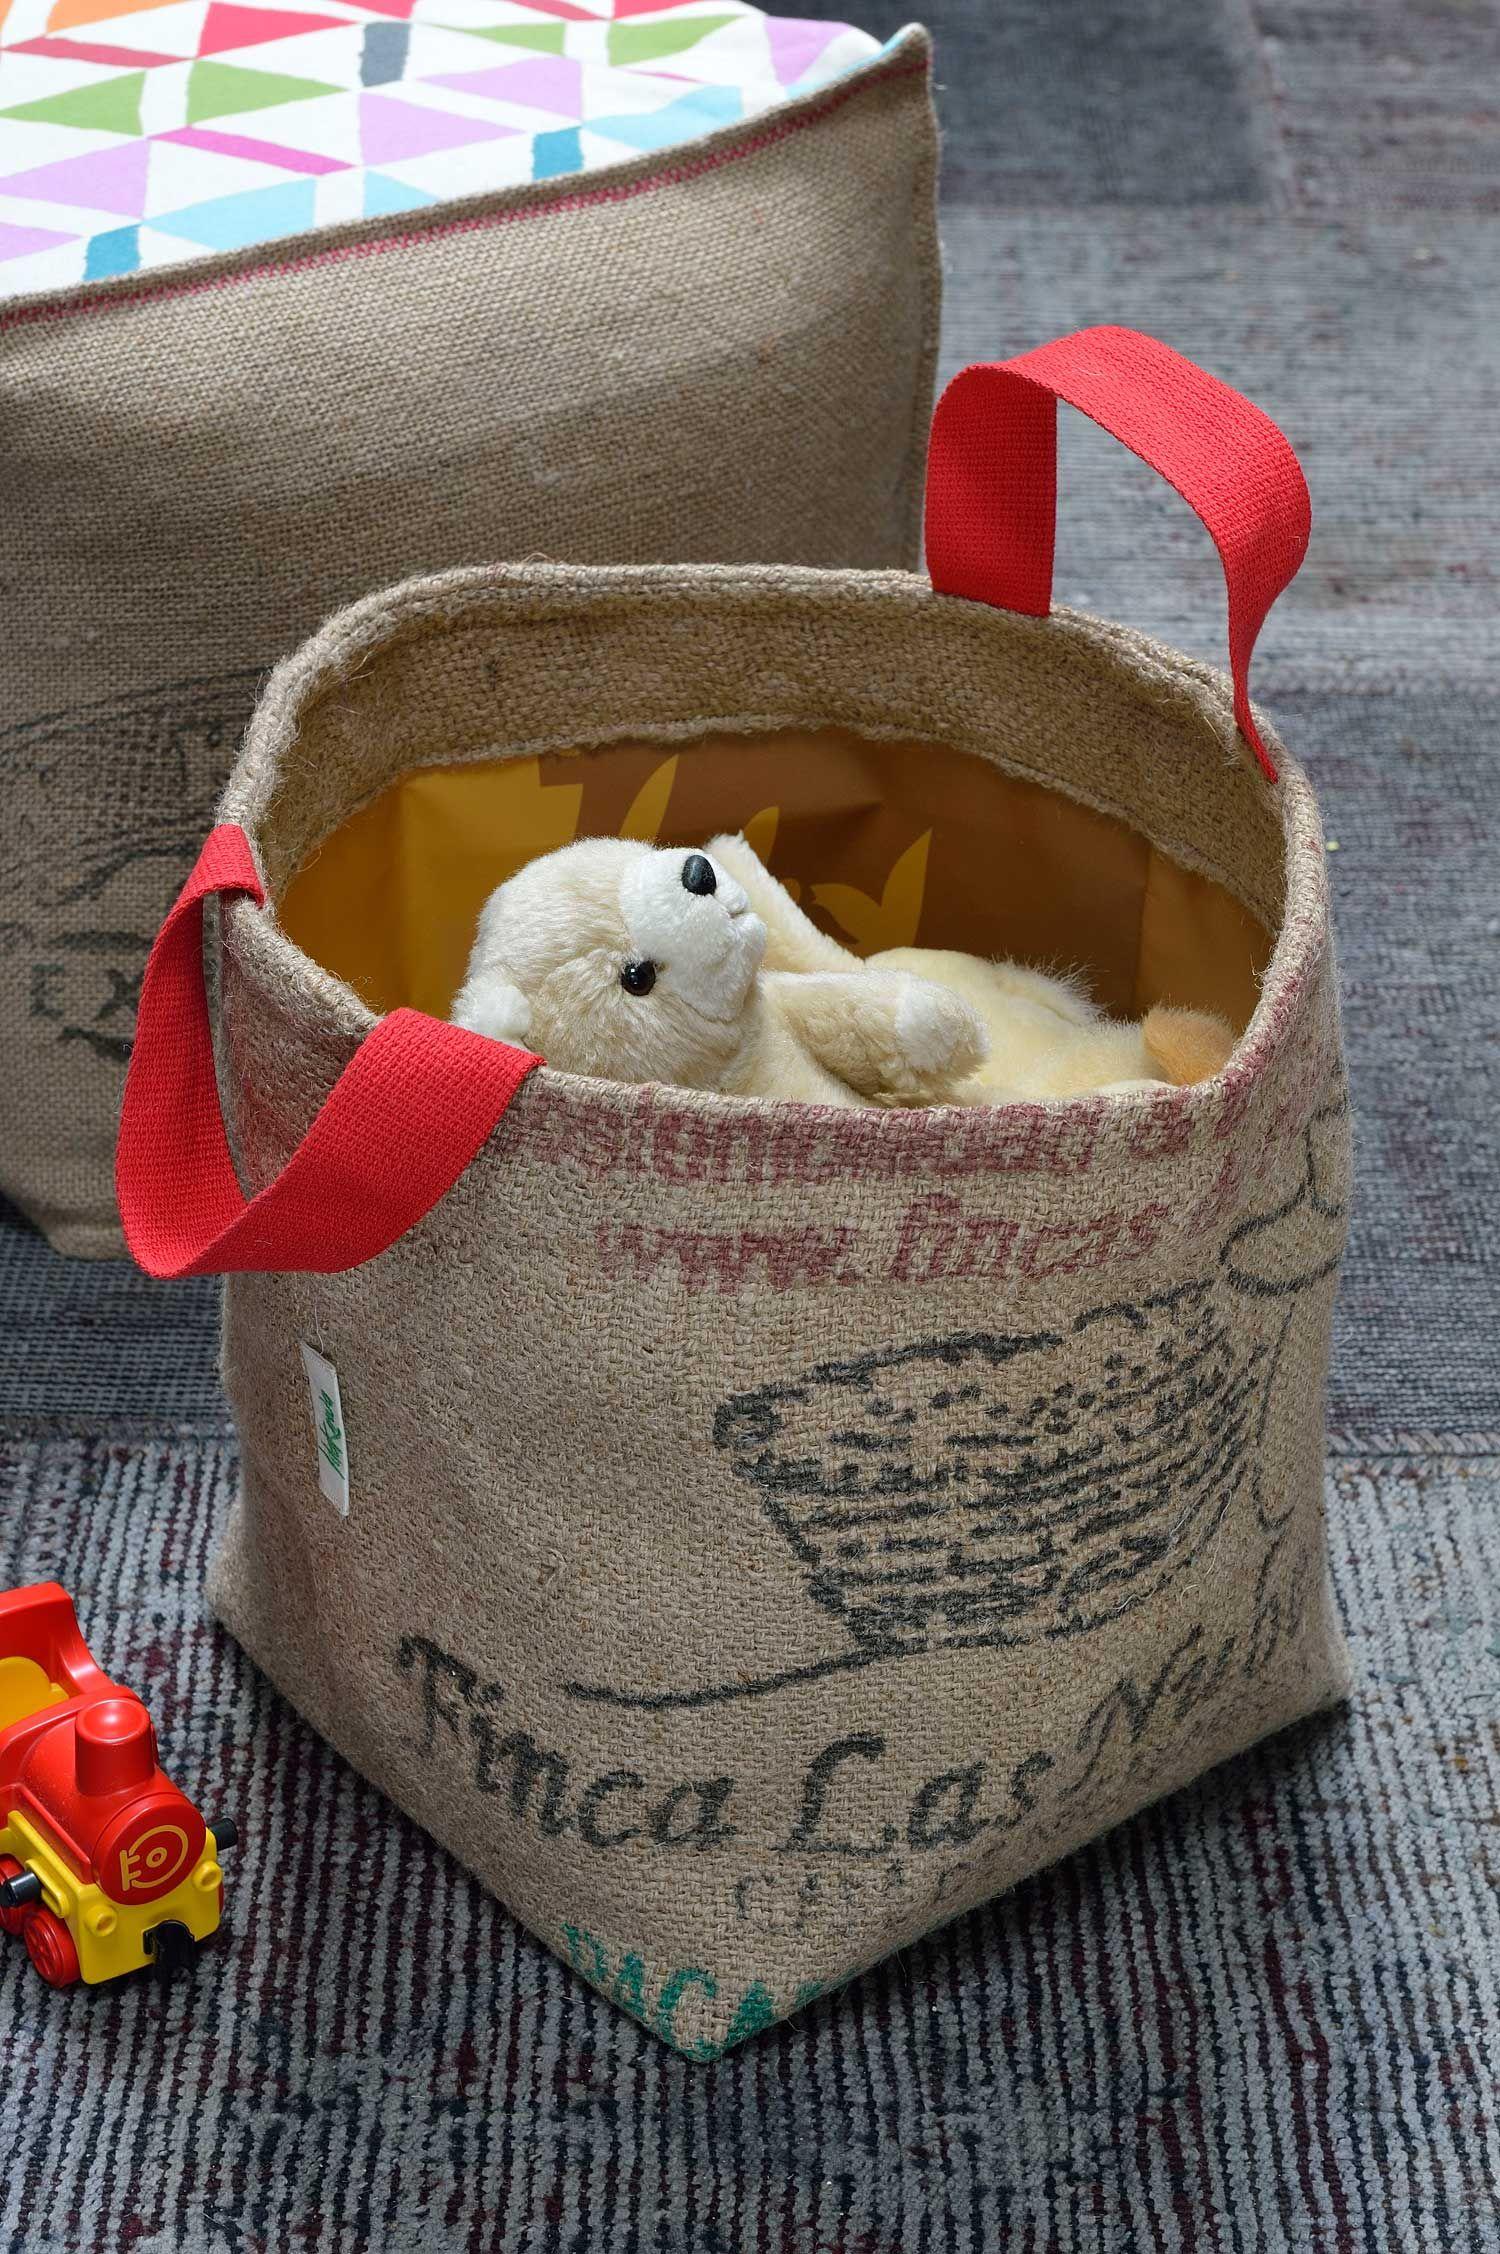 Pani re lilokawa en toile de jute de sacs de caf recycl s for Toile de jute castorama